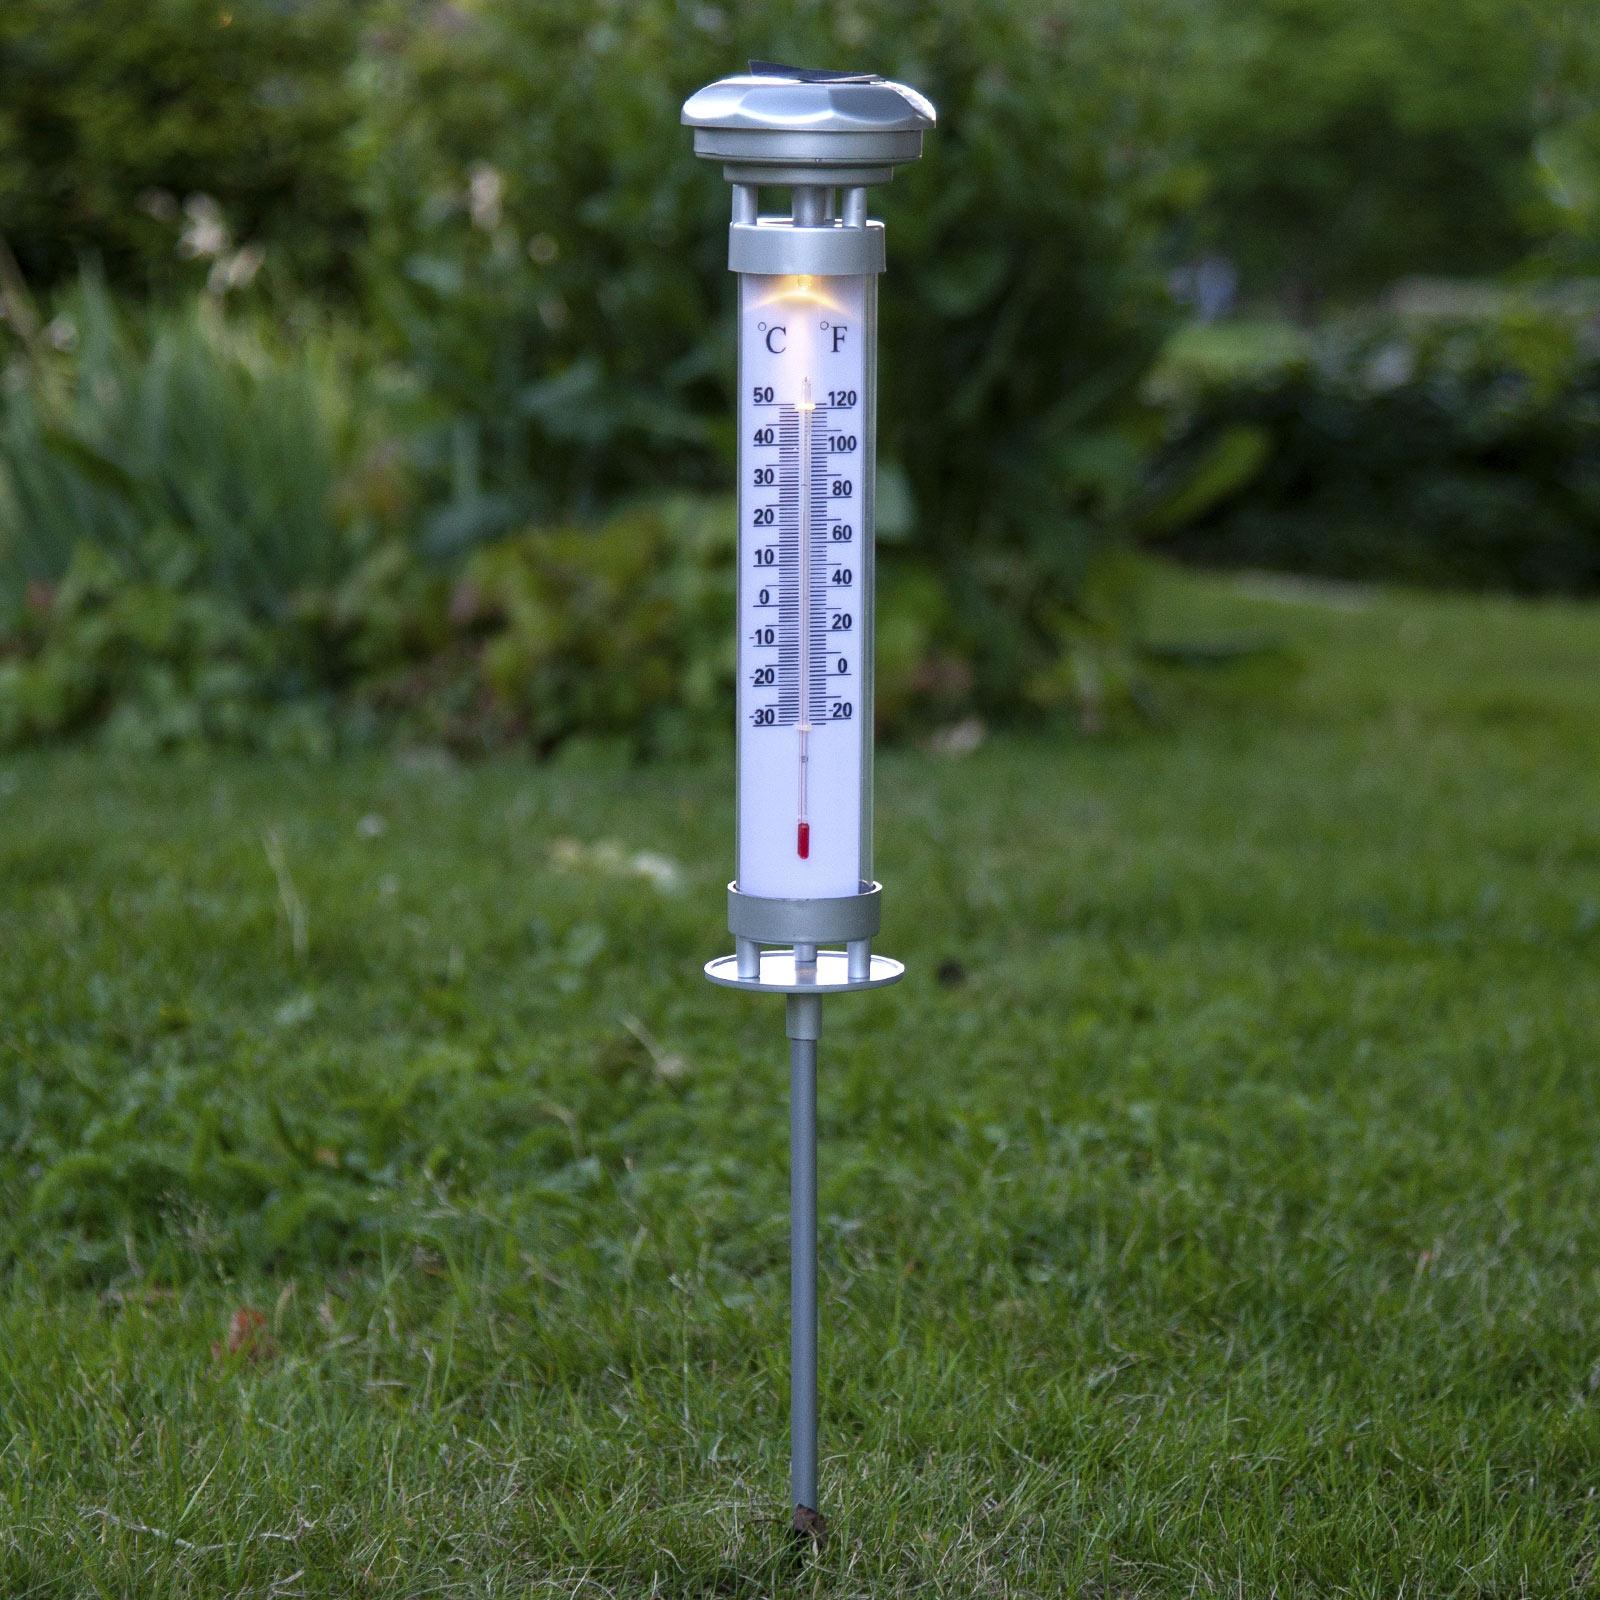 LED-Solarleuchte Celsius, Außenthermometer